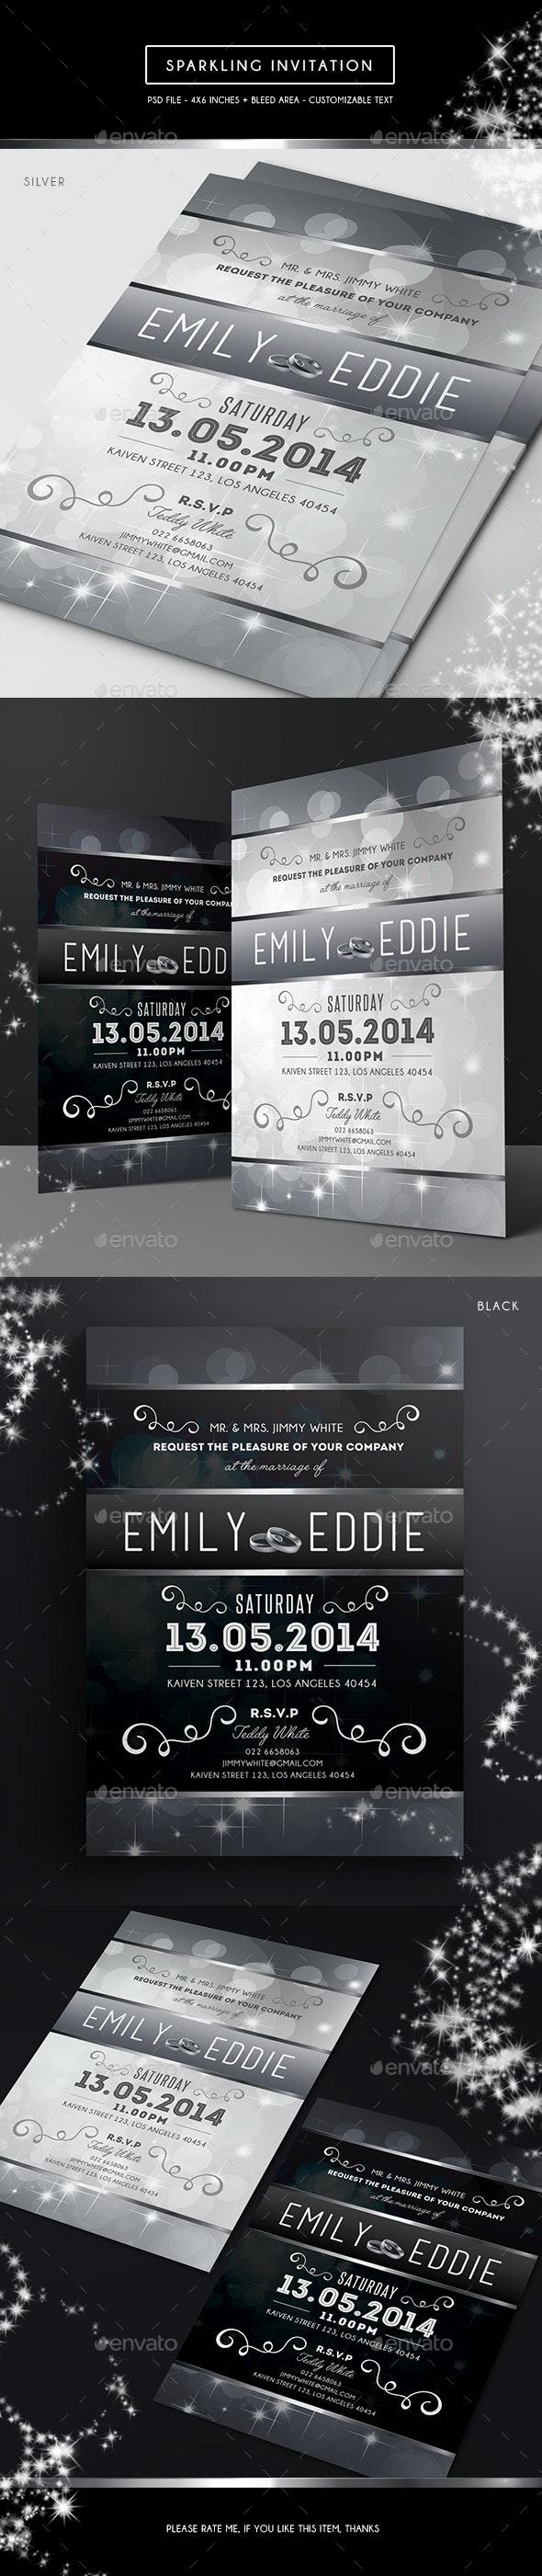 Sparkling Invitation - Weddings Cards & Invites